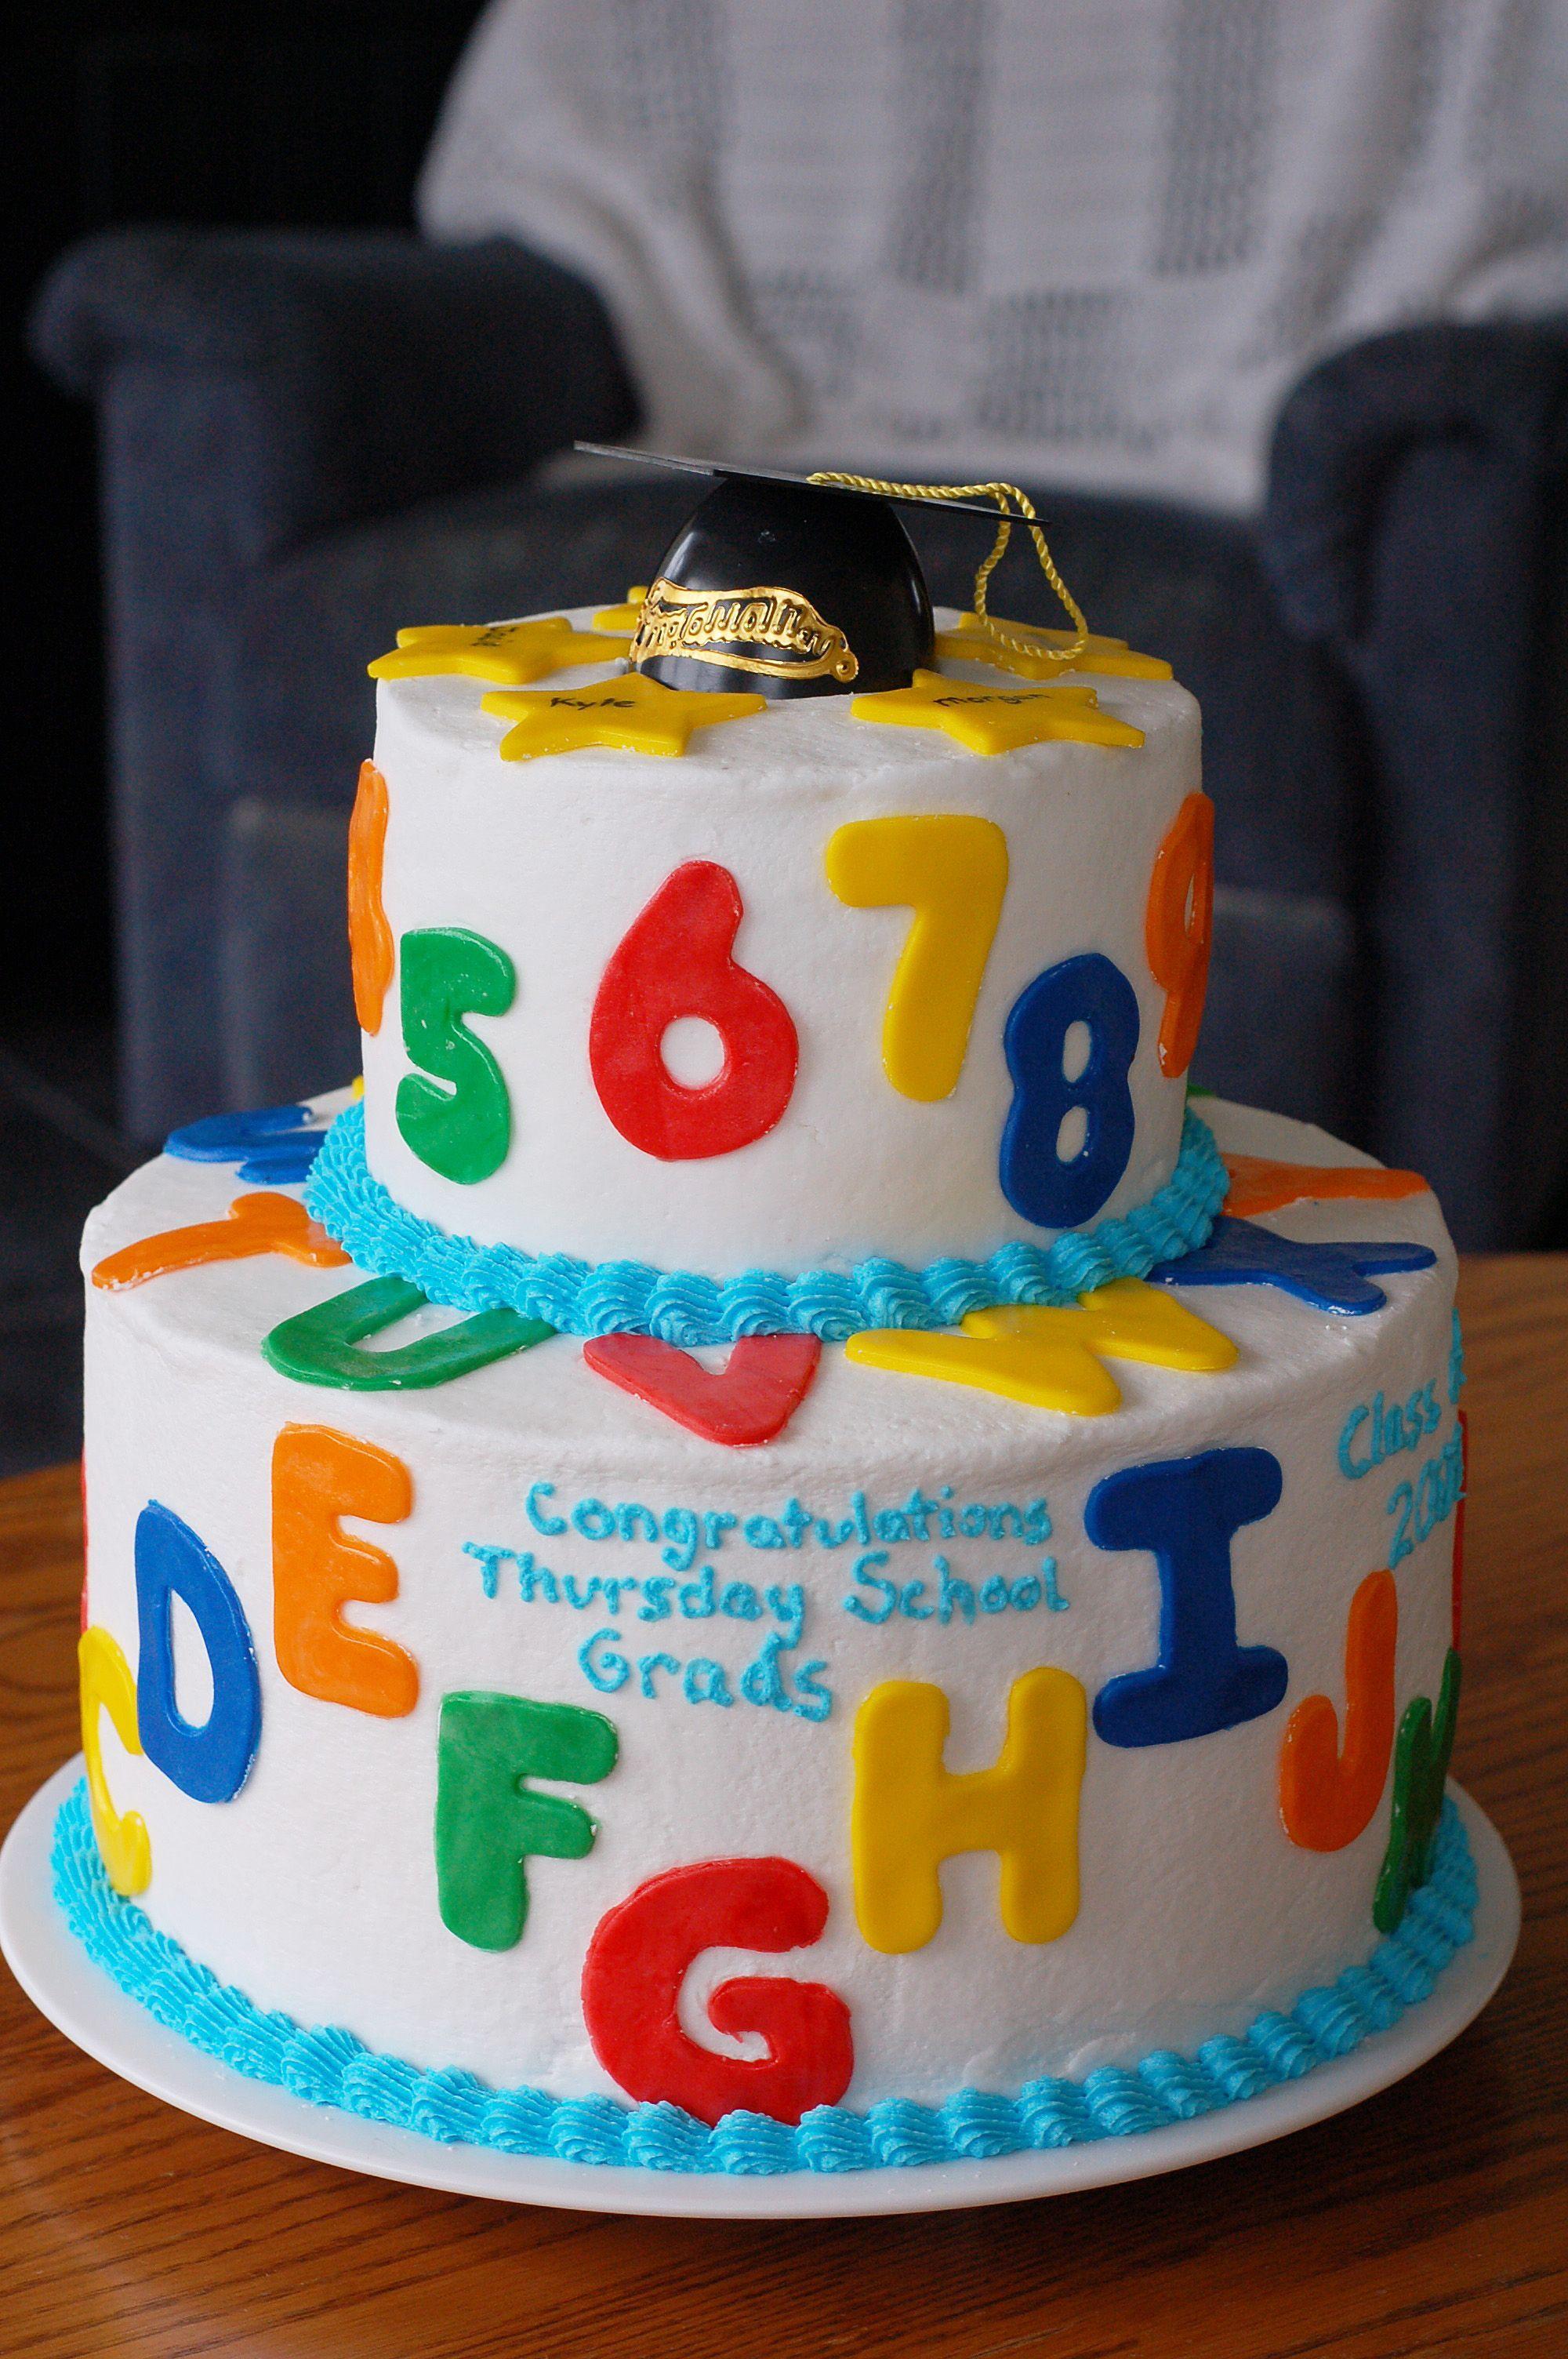 Kindergarten grad Pre-school Graduation cake topper pre-k graduation, grad cake topper pre- graduation Pre K graduation